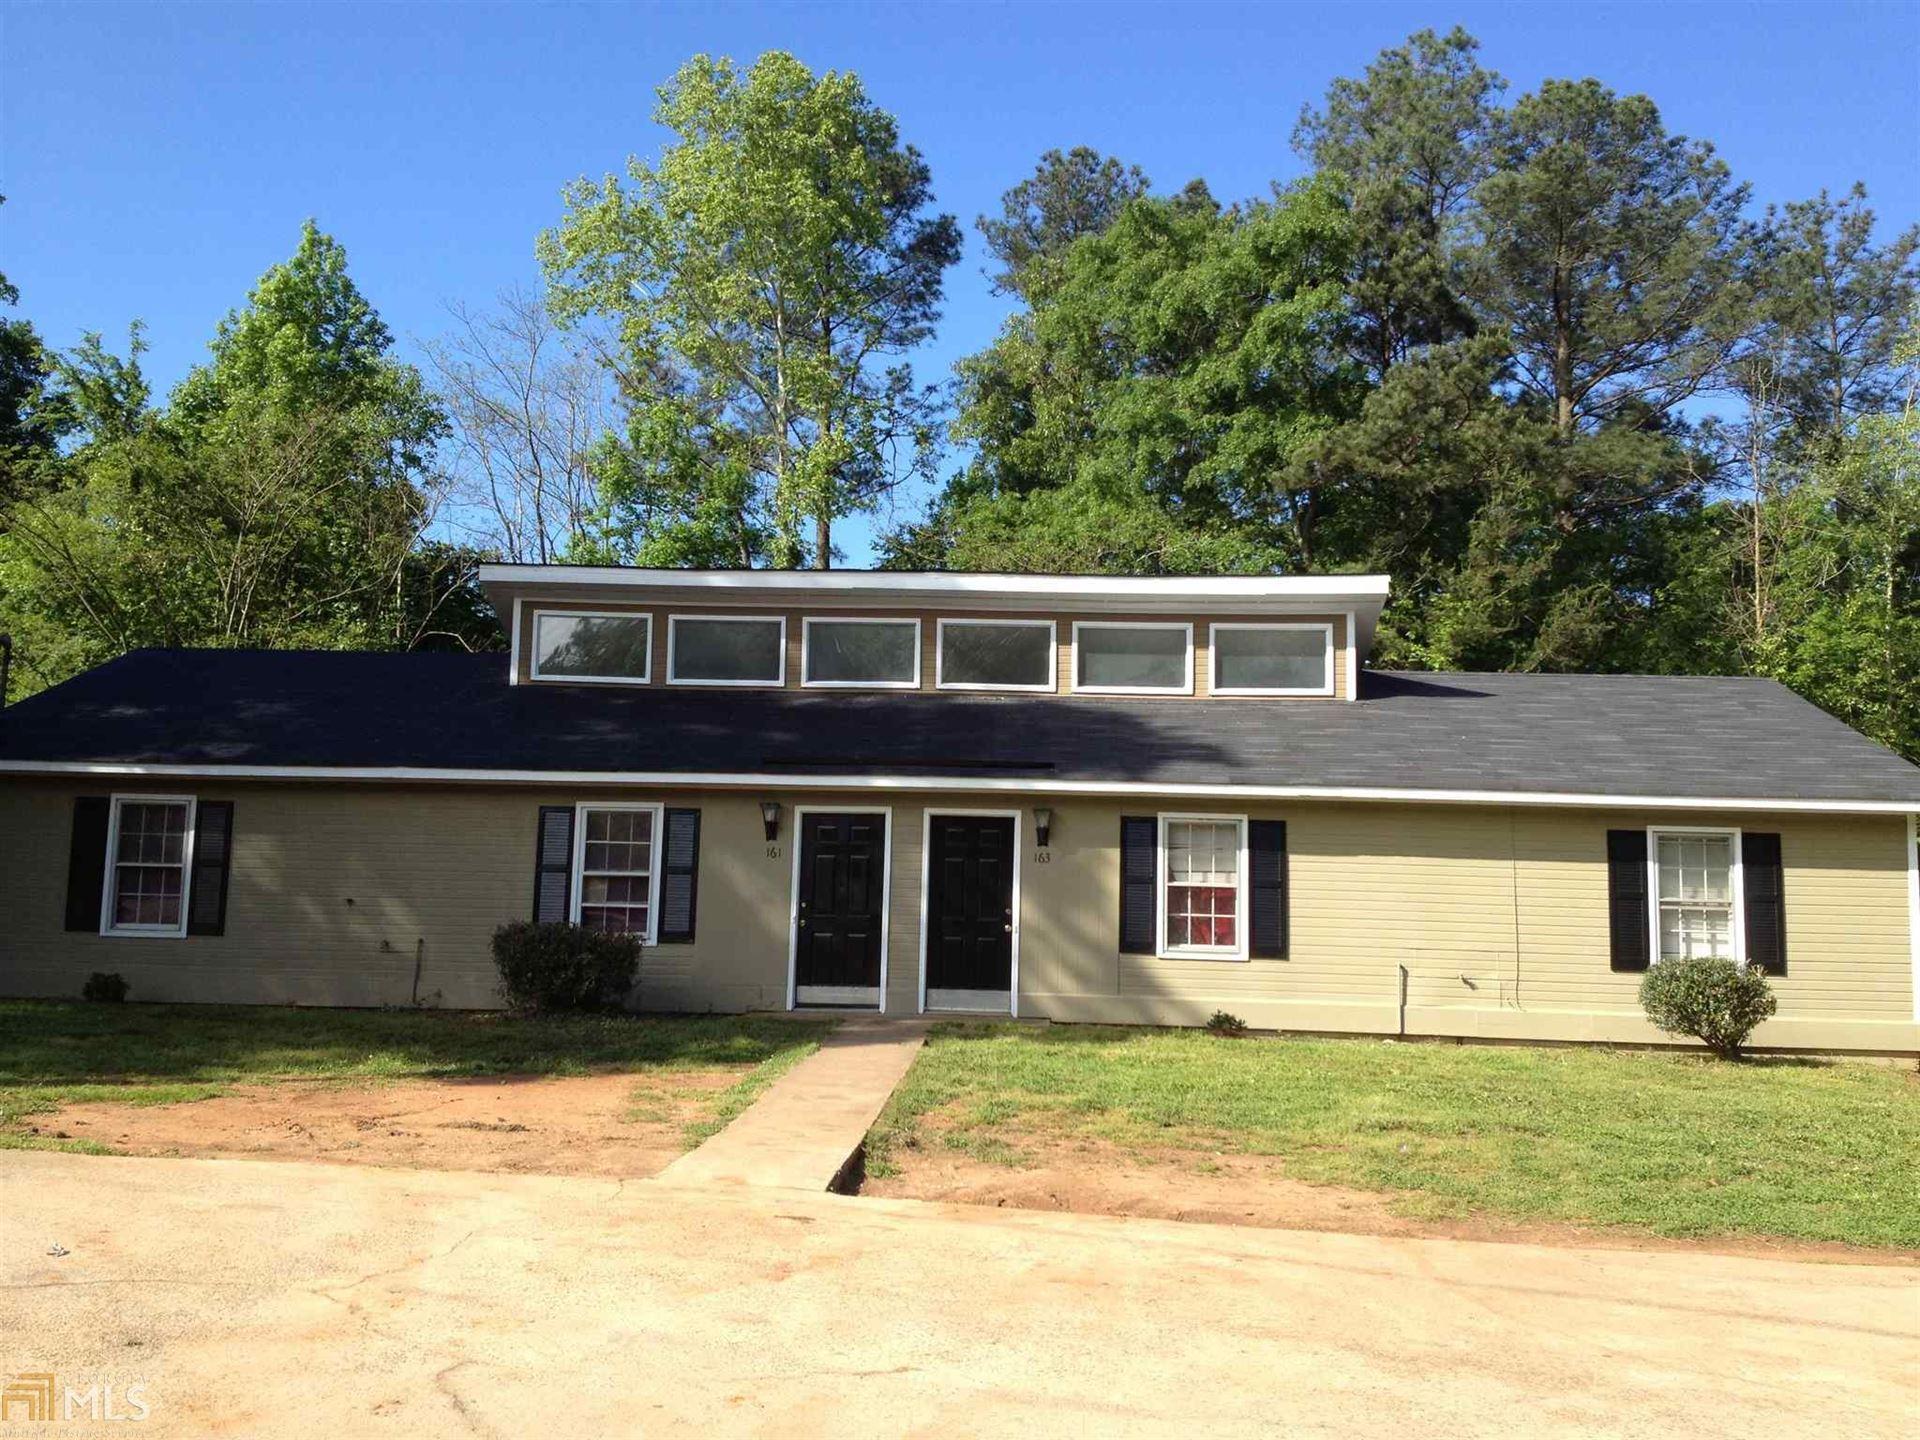 105 Loblolly Dr, Athens, GA 30601 - MLS#: 8910329